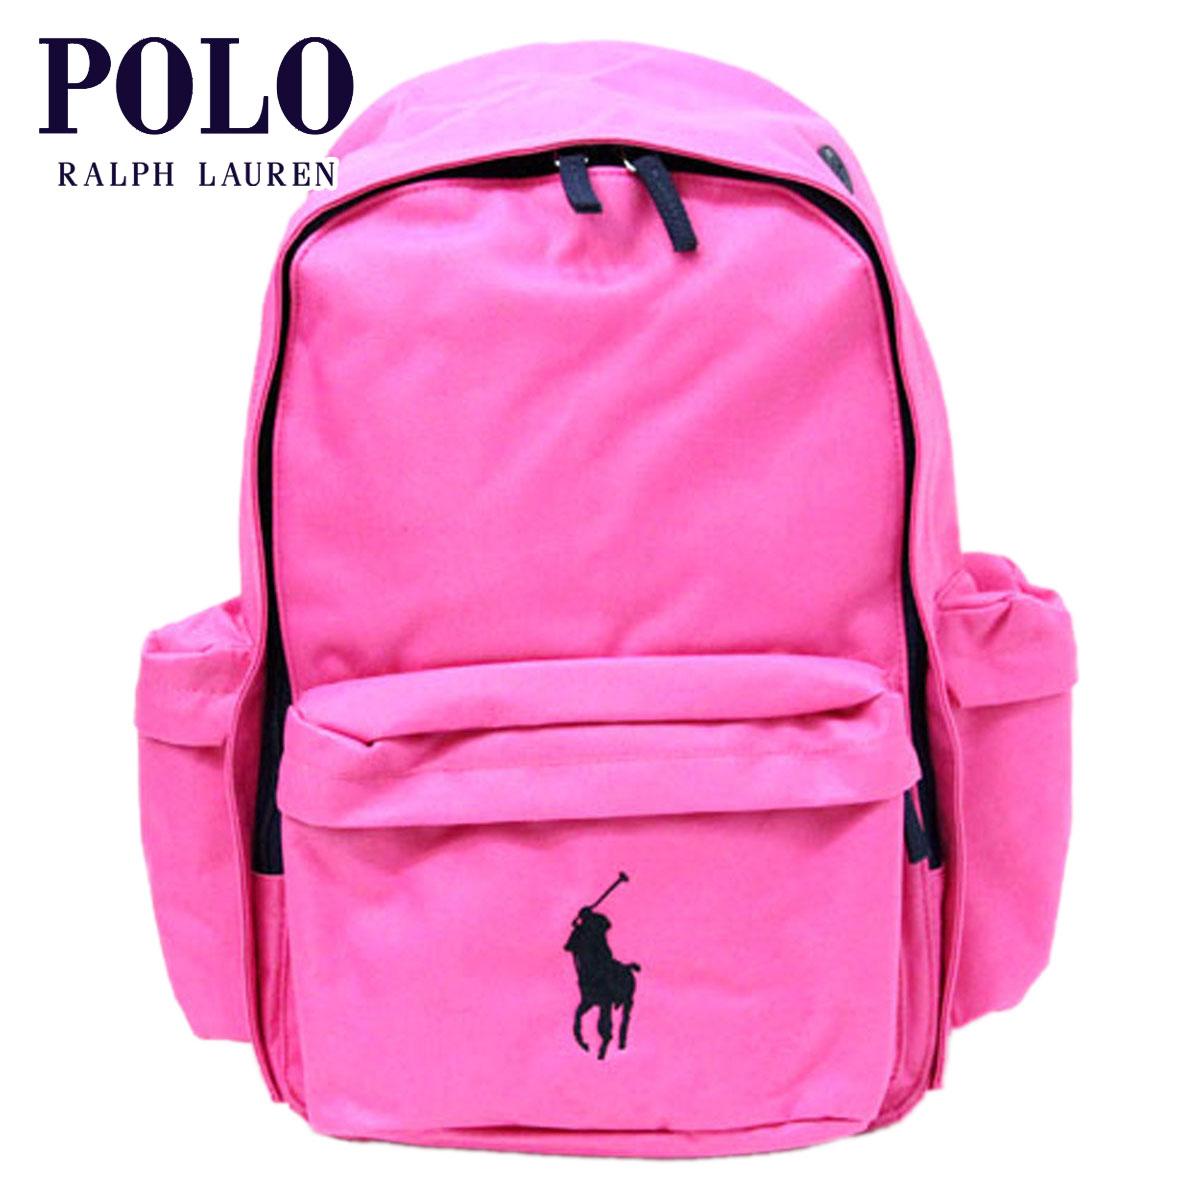 cb54422d099c6 Polo Ralph Lauren POLO RALPH LAUREN genuine bags BIG PONY School Backpack  (H42.5 W28 D15.5cm) P06Dec14